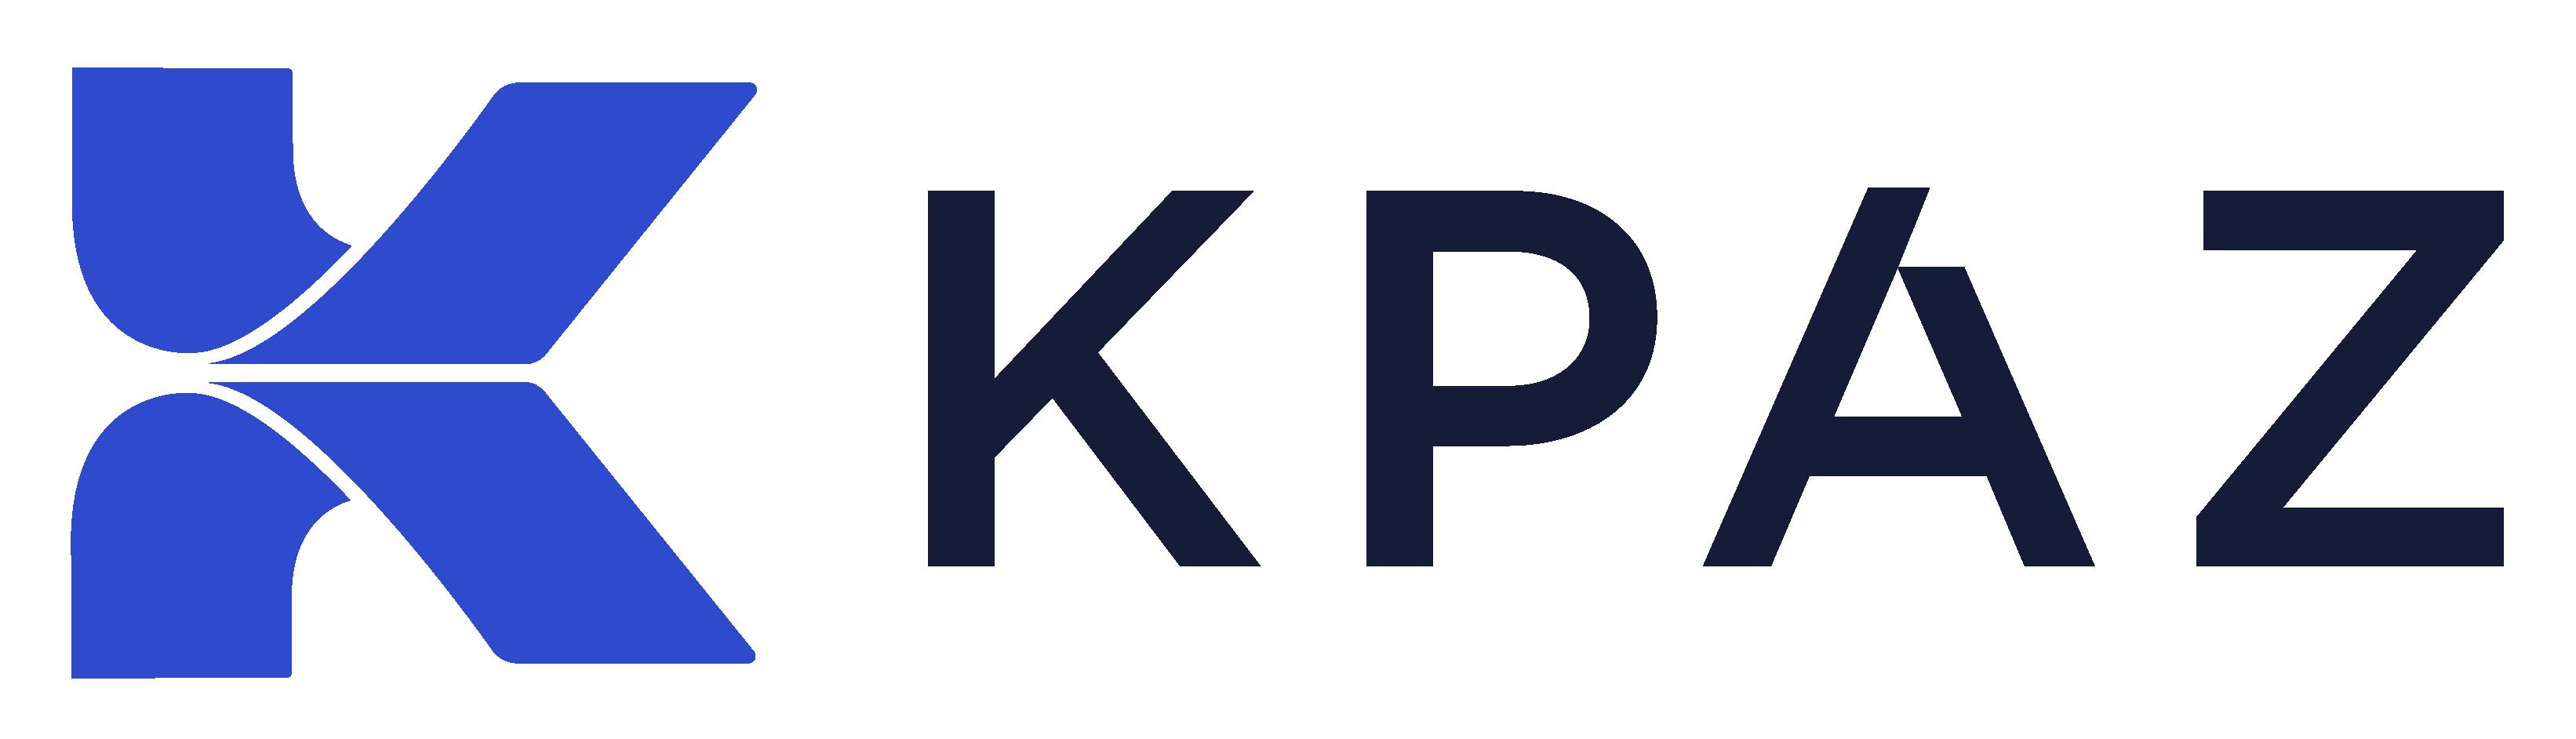 KPaz Consultores logo